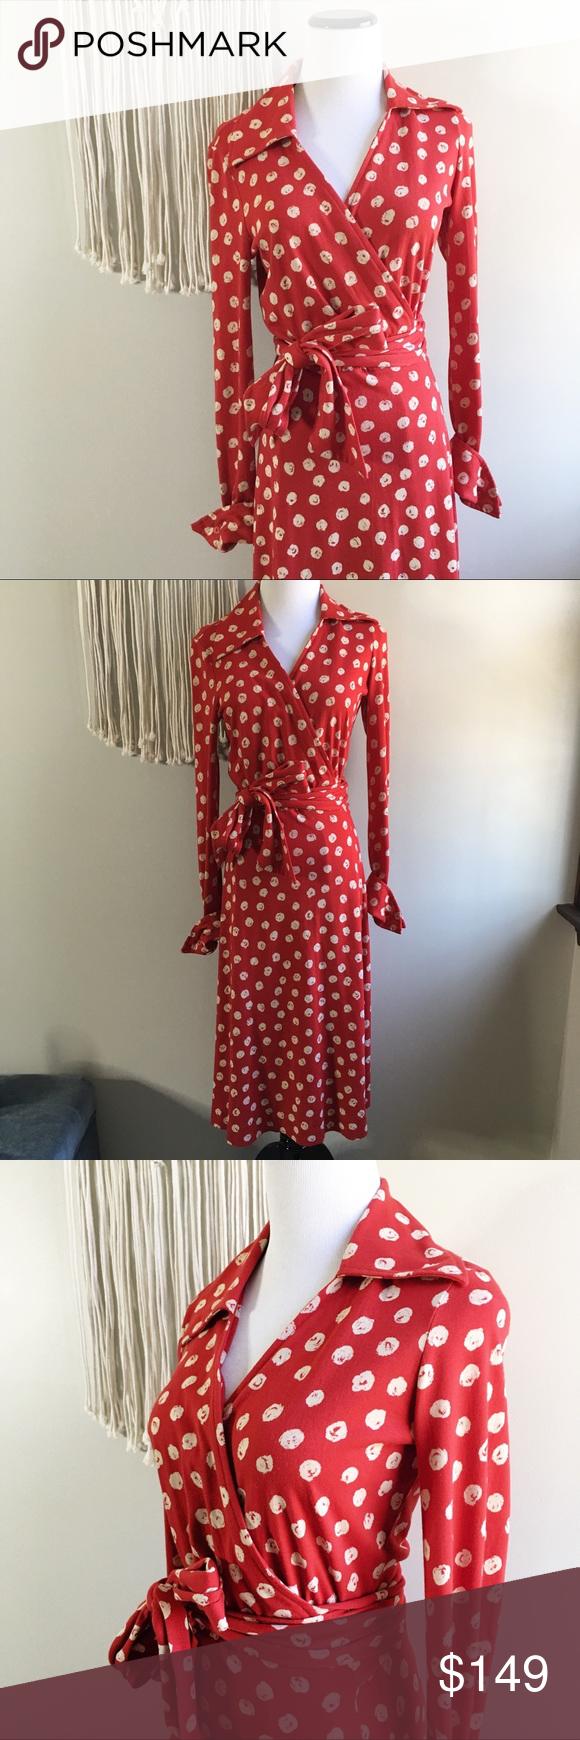 Vintage 1970s Diane Von Furstenberg Wrap Dress Vintage Dvf Classic Wrap Dress In 100 Acrylic Cl Diane Von Furstenberg Wrap Dress Wrap Dress Long Sleeve Dress [ 1740 x 580 Pixel ]